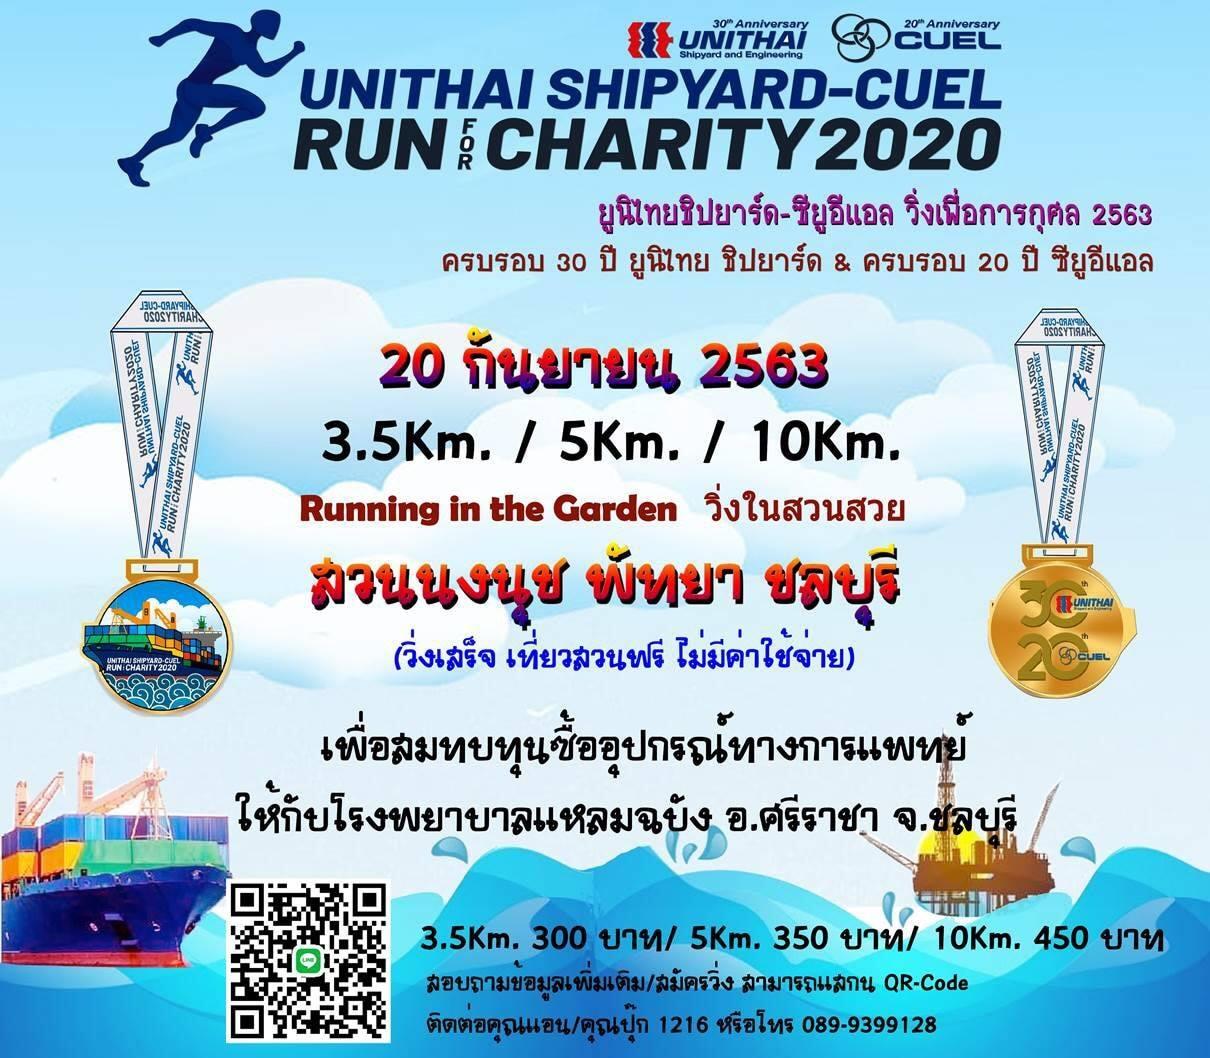 Unithai Shipyard-Cuel Run for Charity 2020